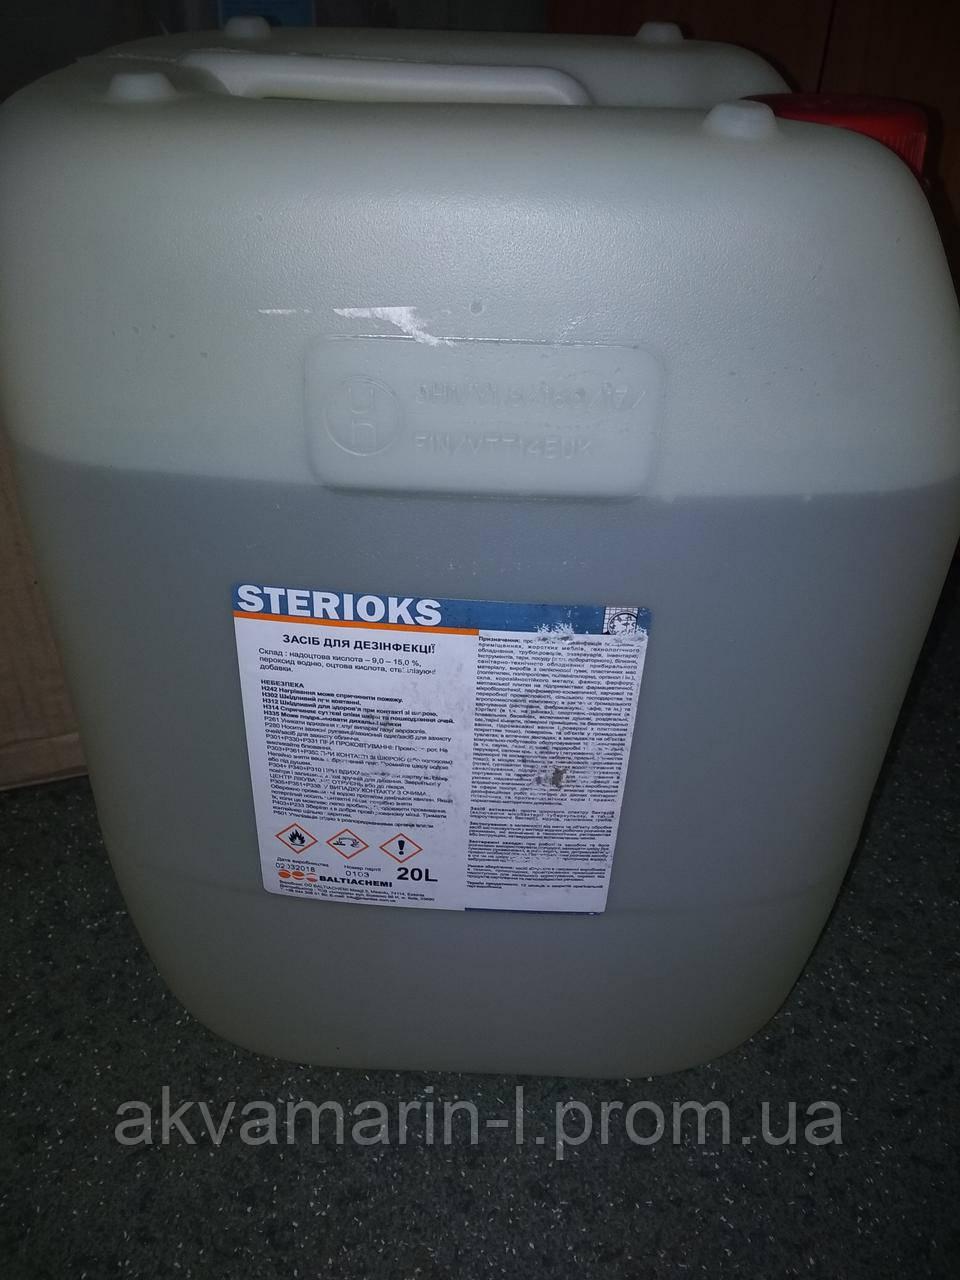 Стериокс (STERIOKS) 20л (удаление плесени)